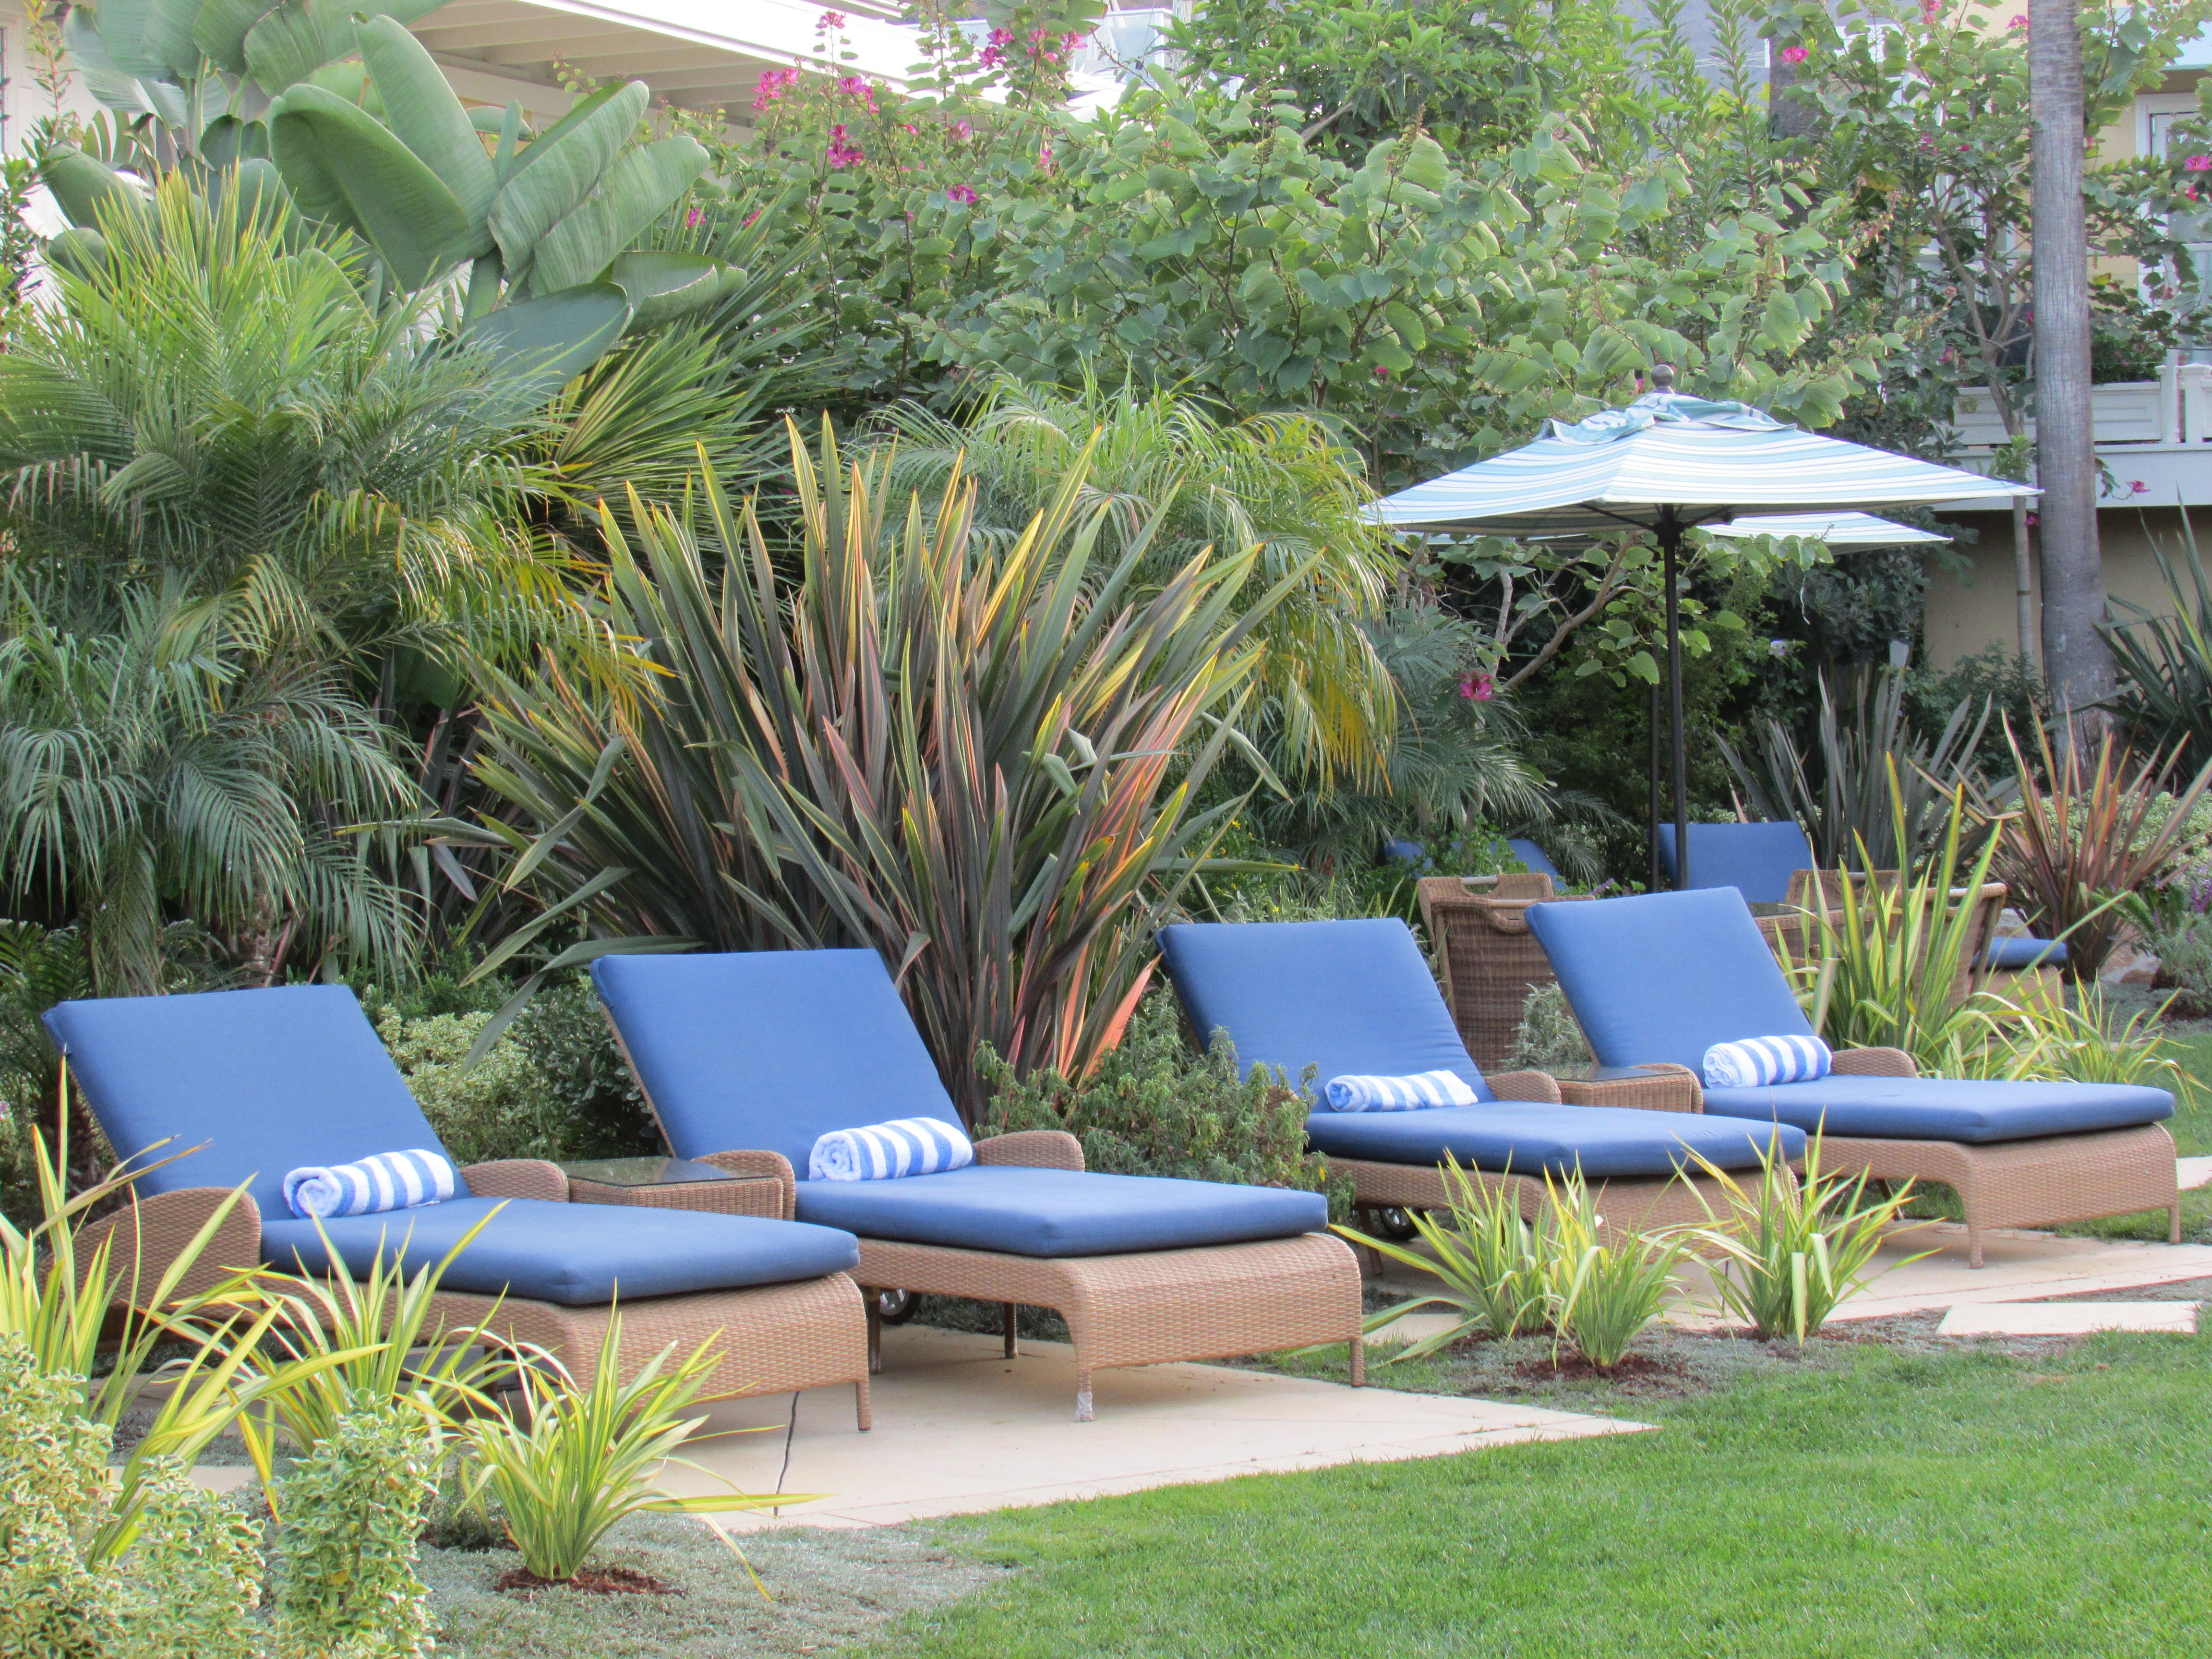 Pavilion Hotel Catalina Island Catalina Island Hotels